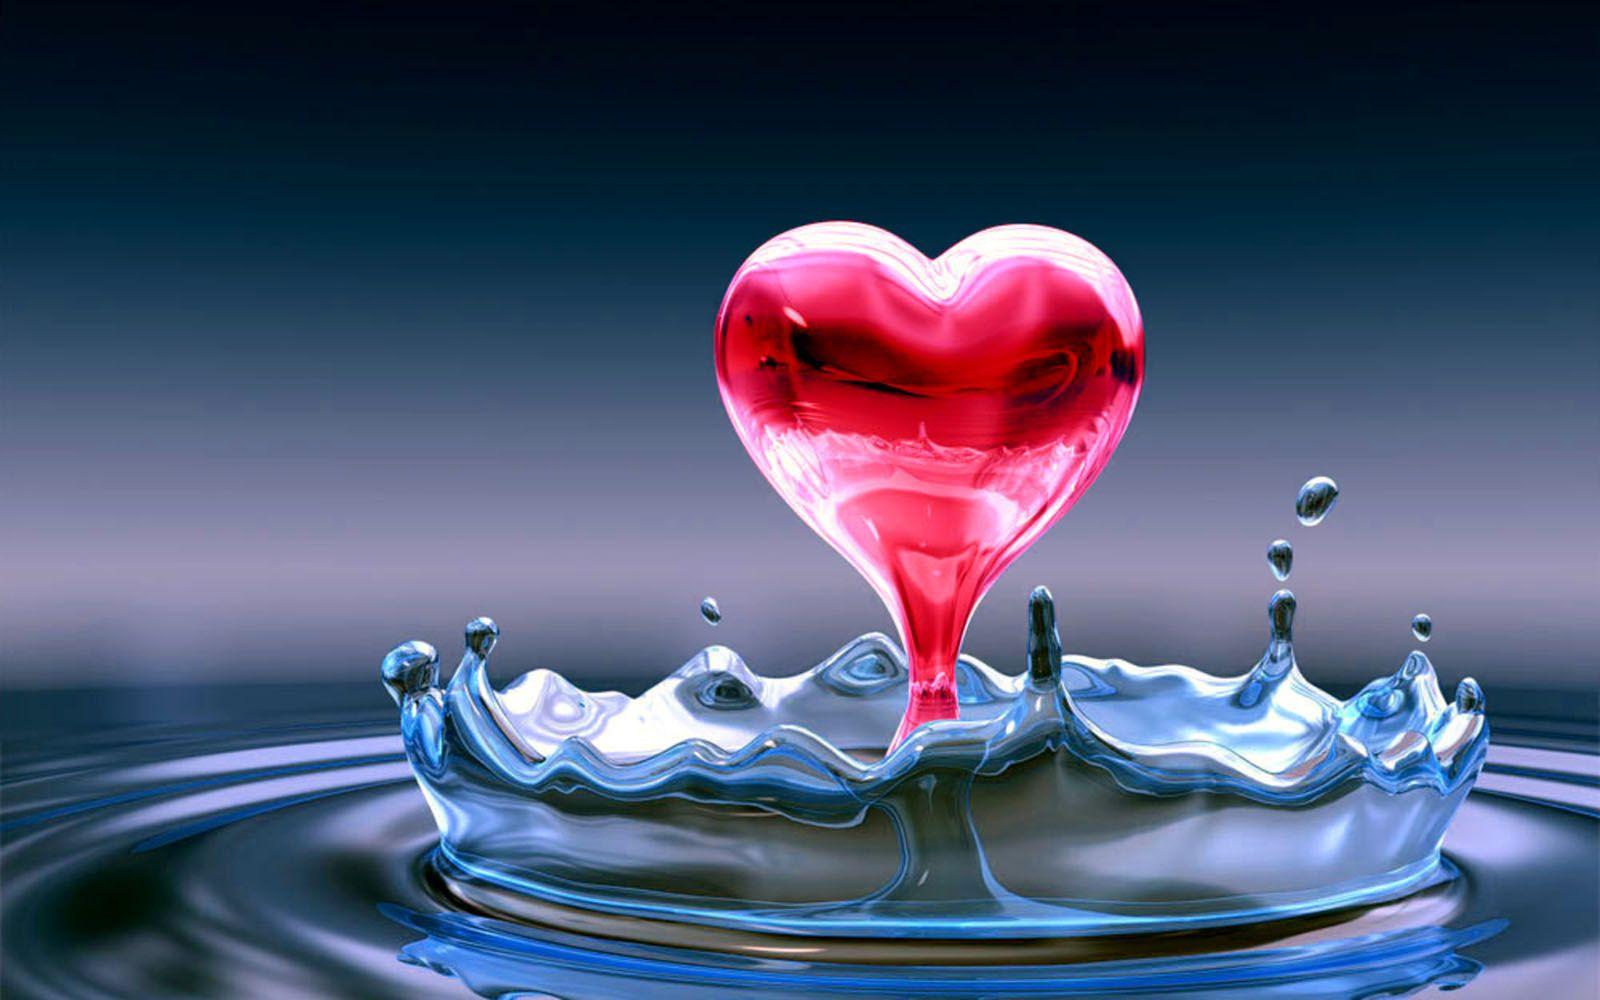 Wallpaper download of love - Love Wallpaper Wallpapers For Free Download About Wallpapers